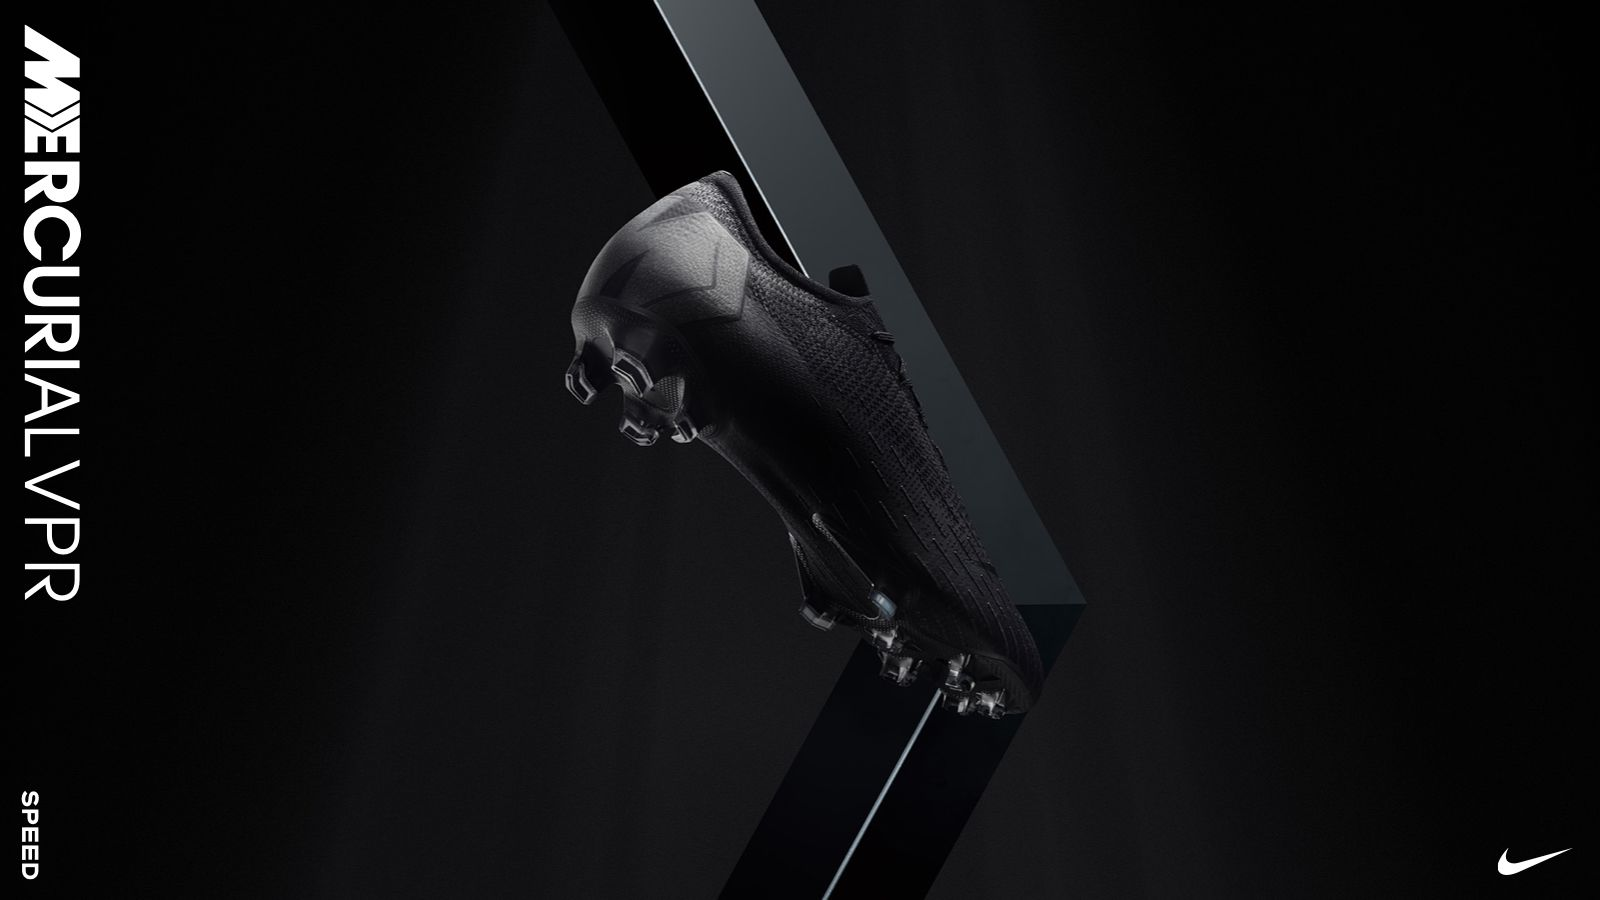 b260db1a550 Stealth Ops Mercurial Vapor 360 Elite FG. Nike.com